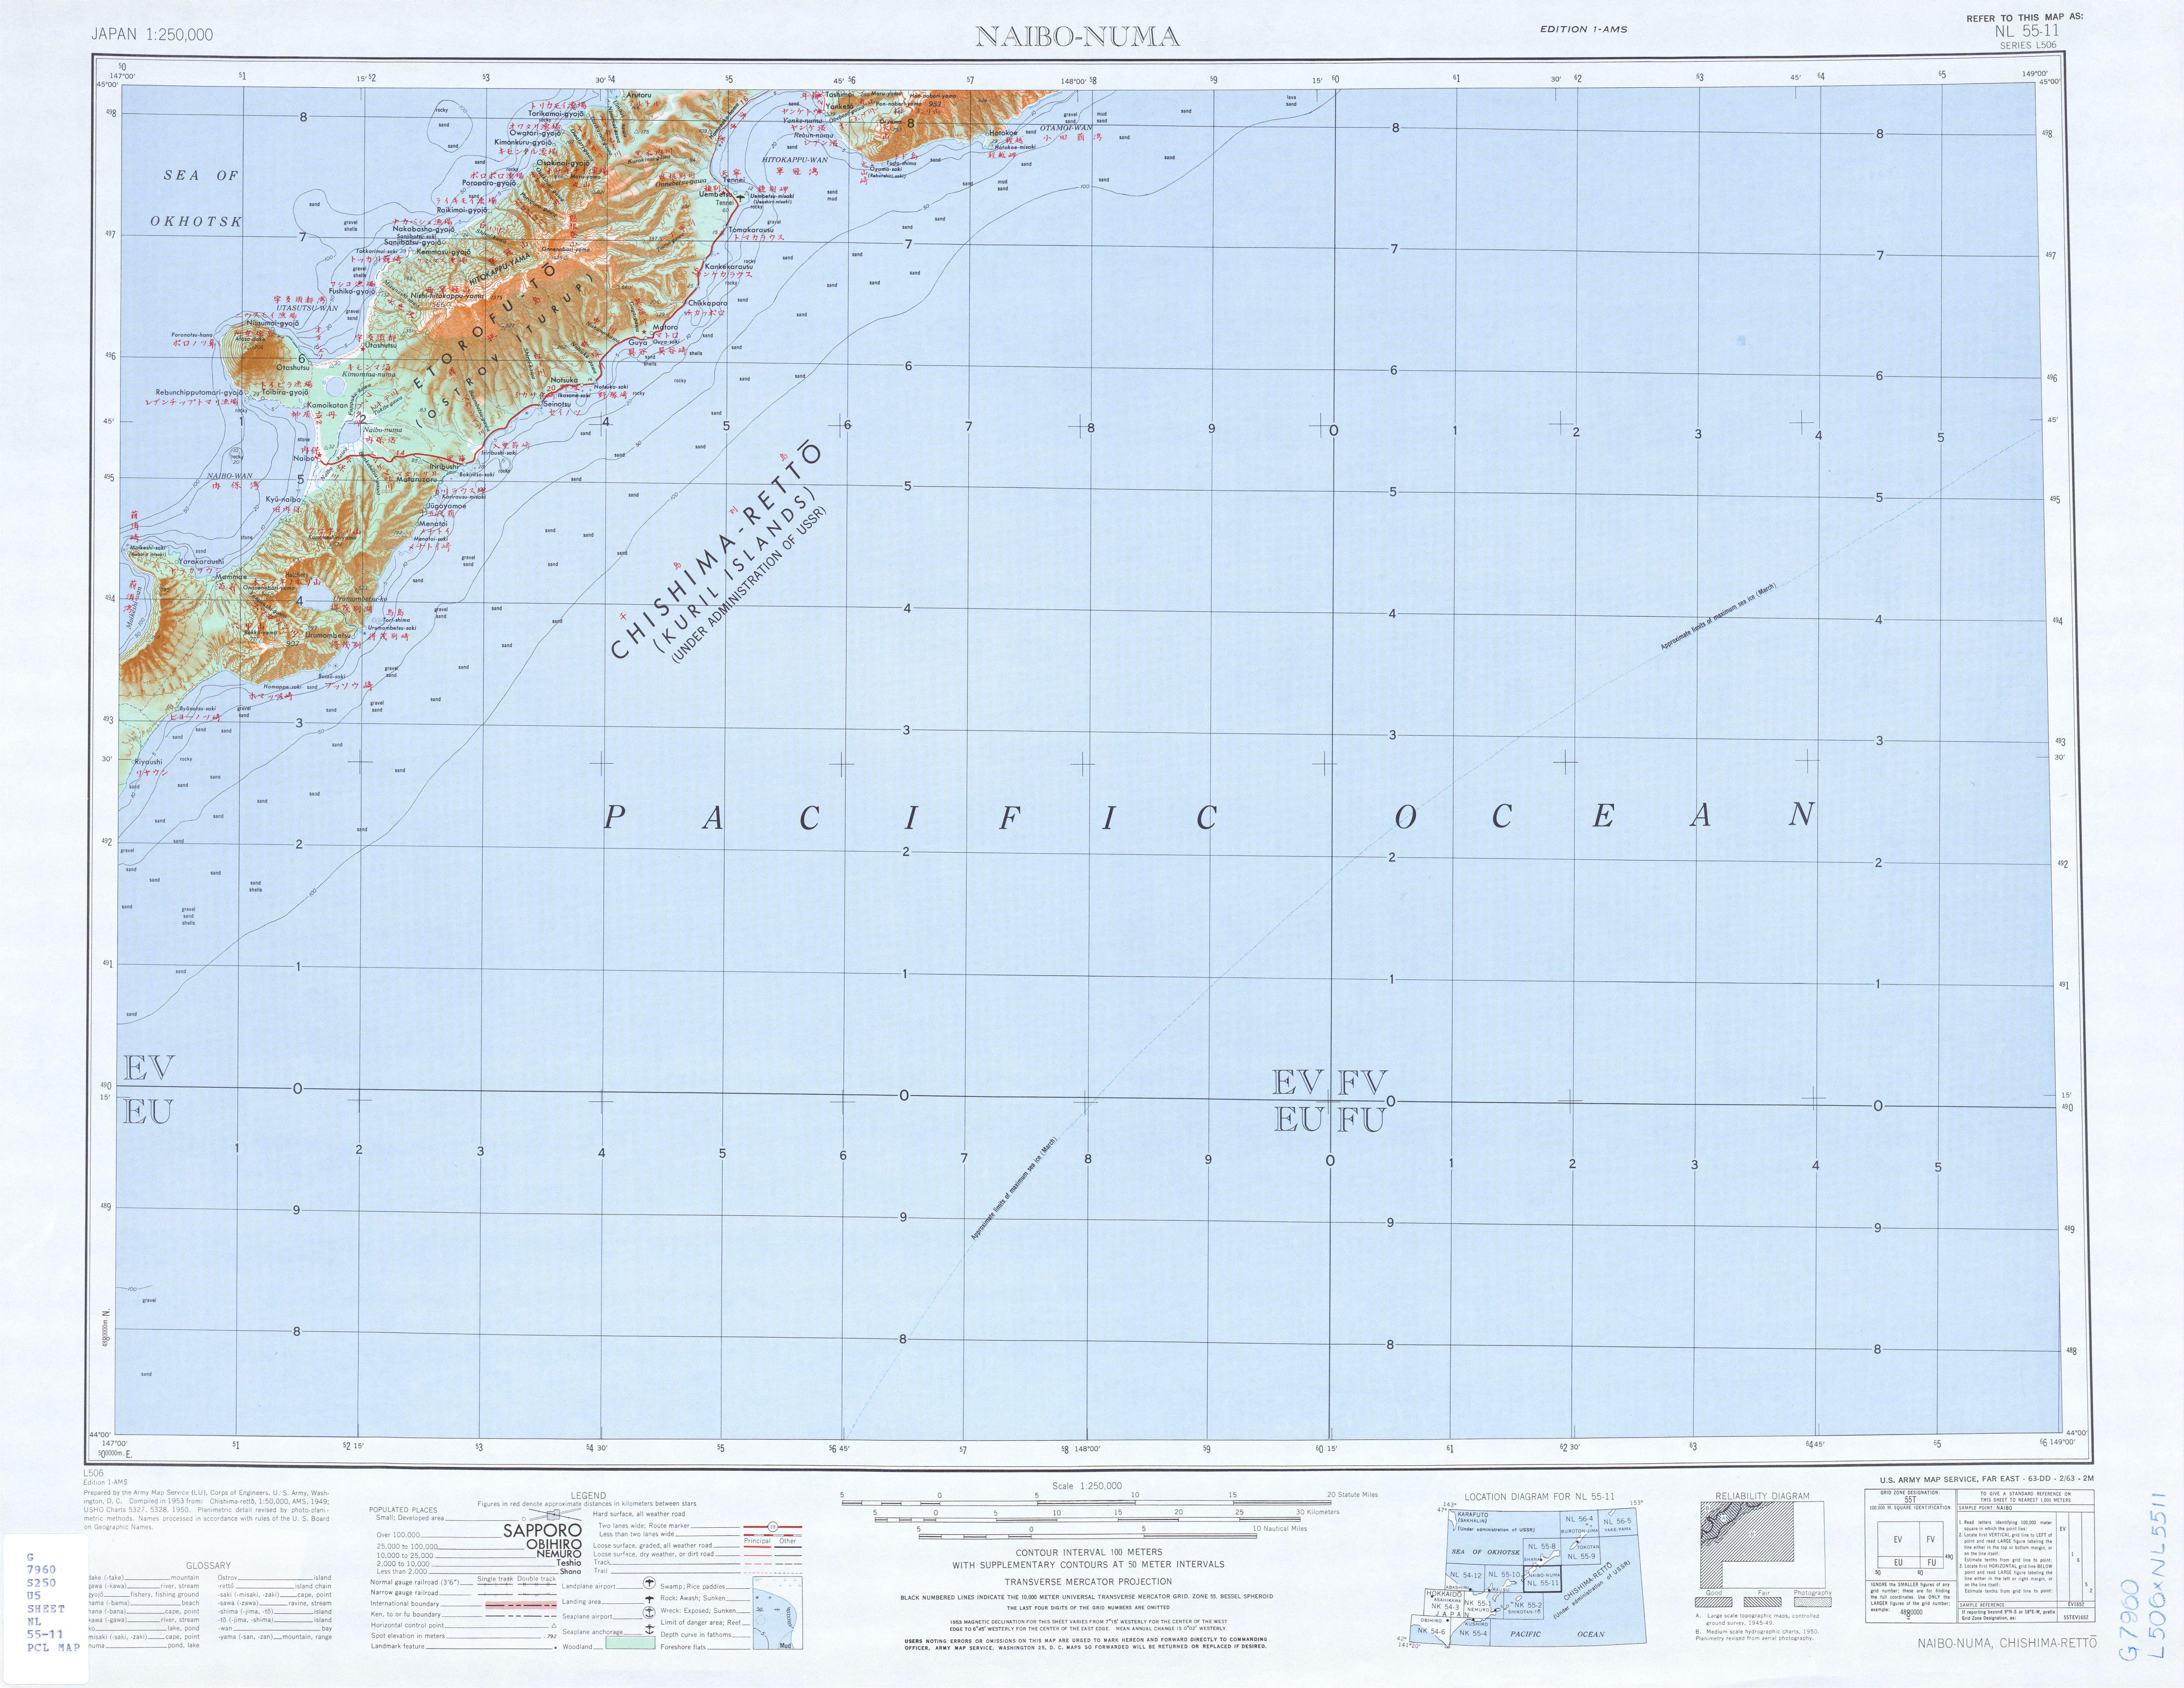 Hoja Naibo-Numa del Mapa Topográfico de Japón 1954